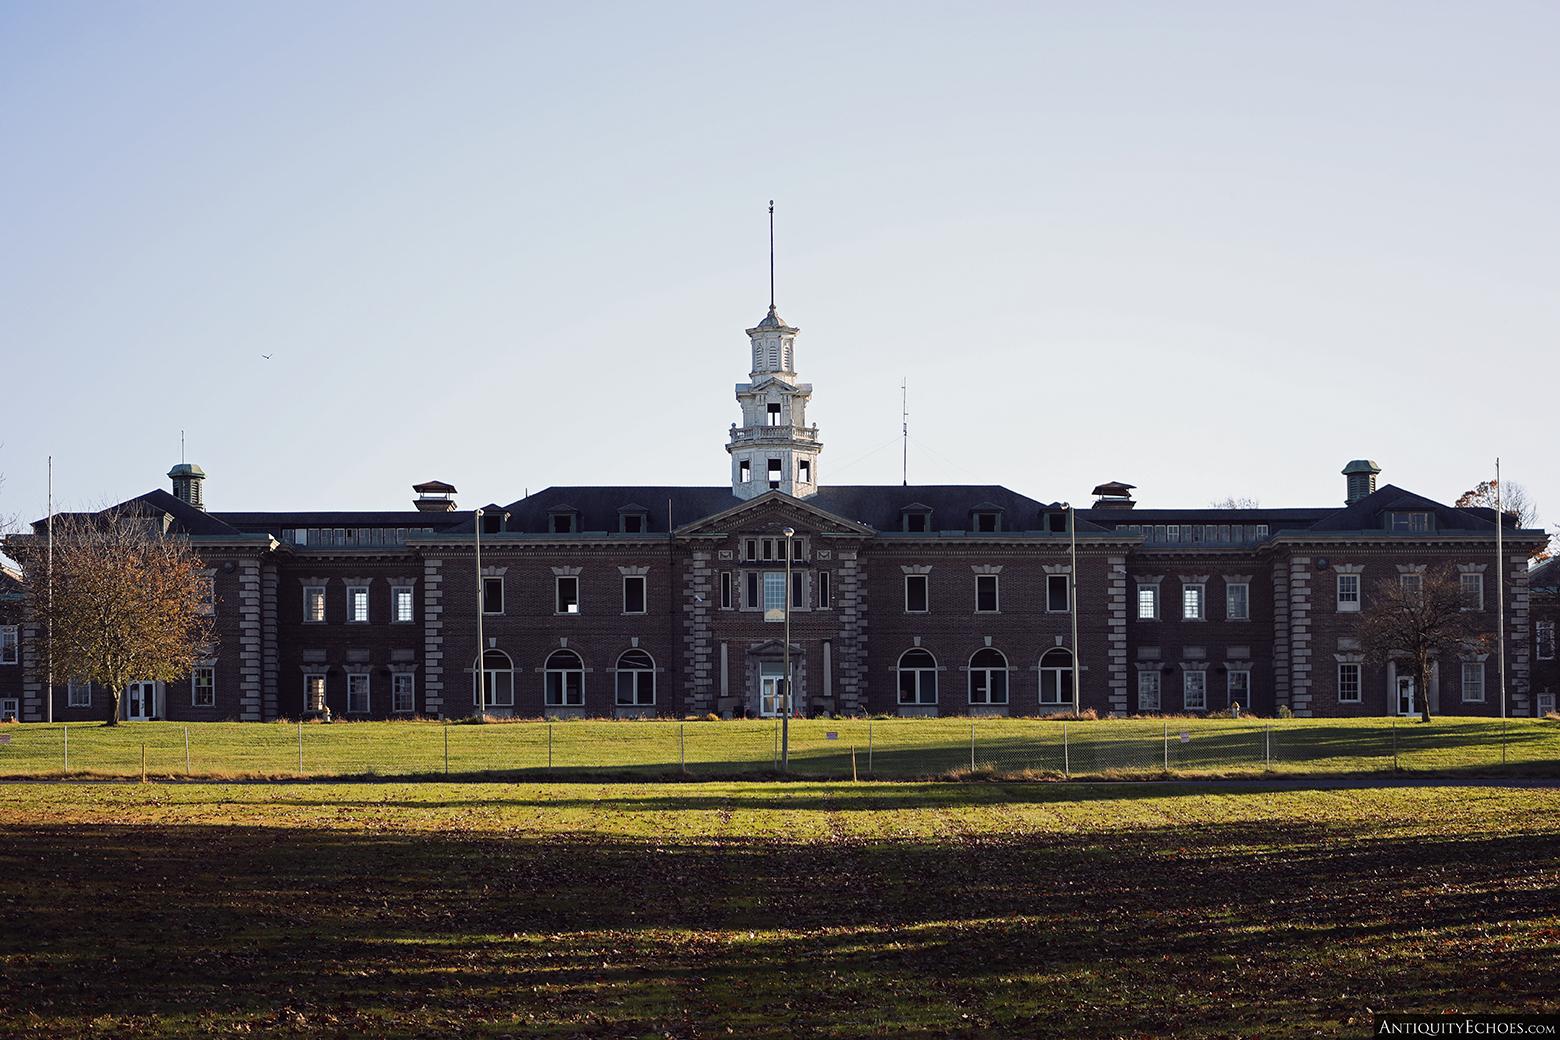 Allentown State Hospital - A Sad Sight